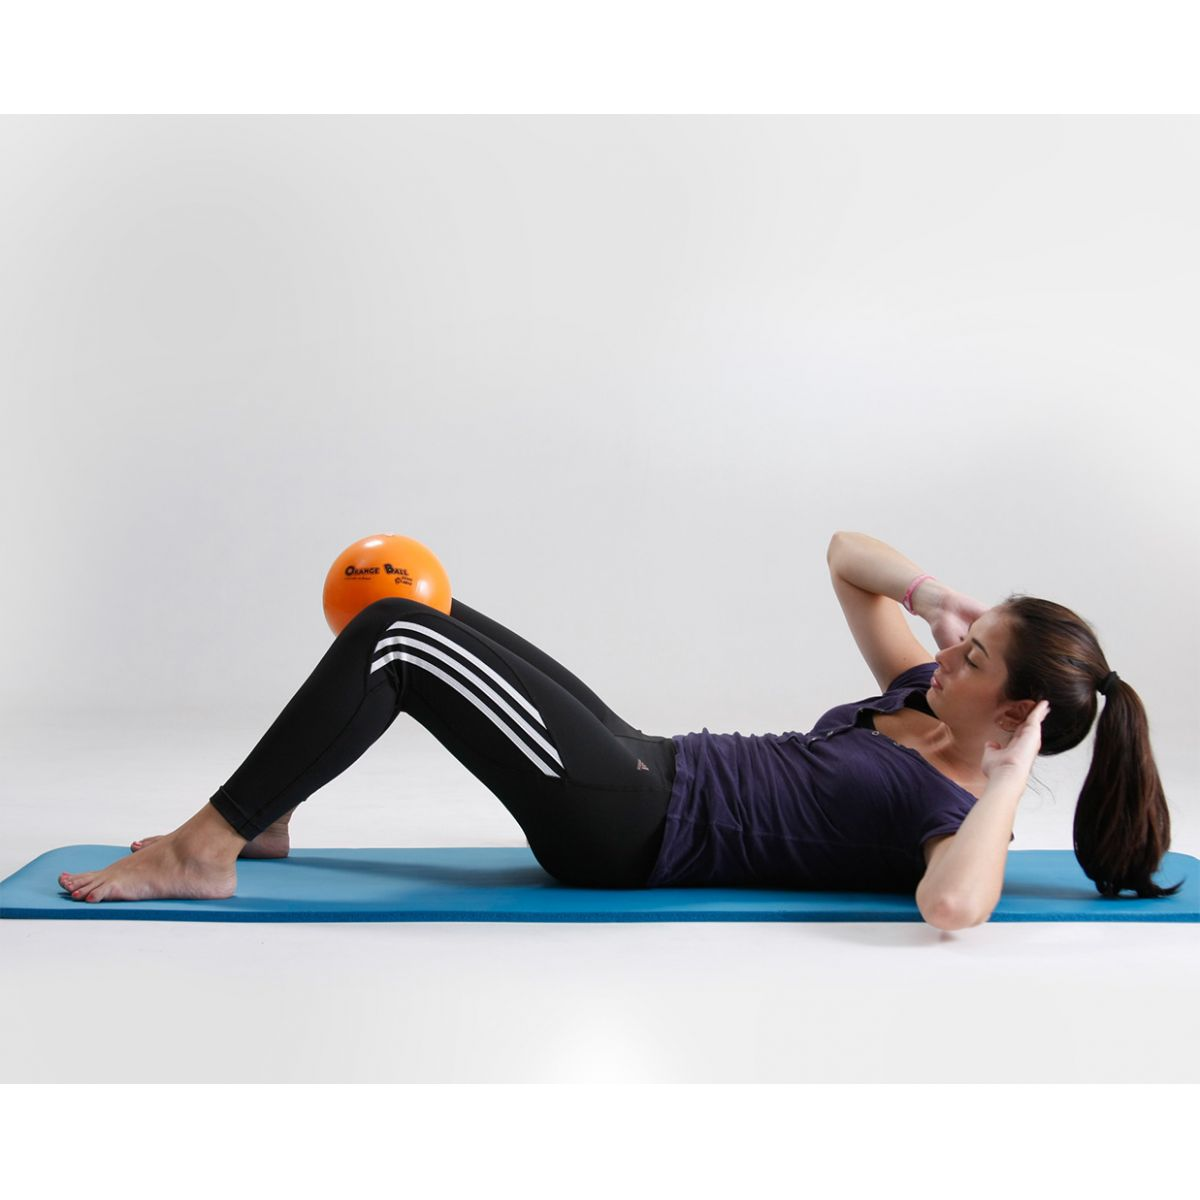 Bola para exercícios Orange Ball - BL.01.26